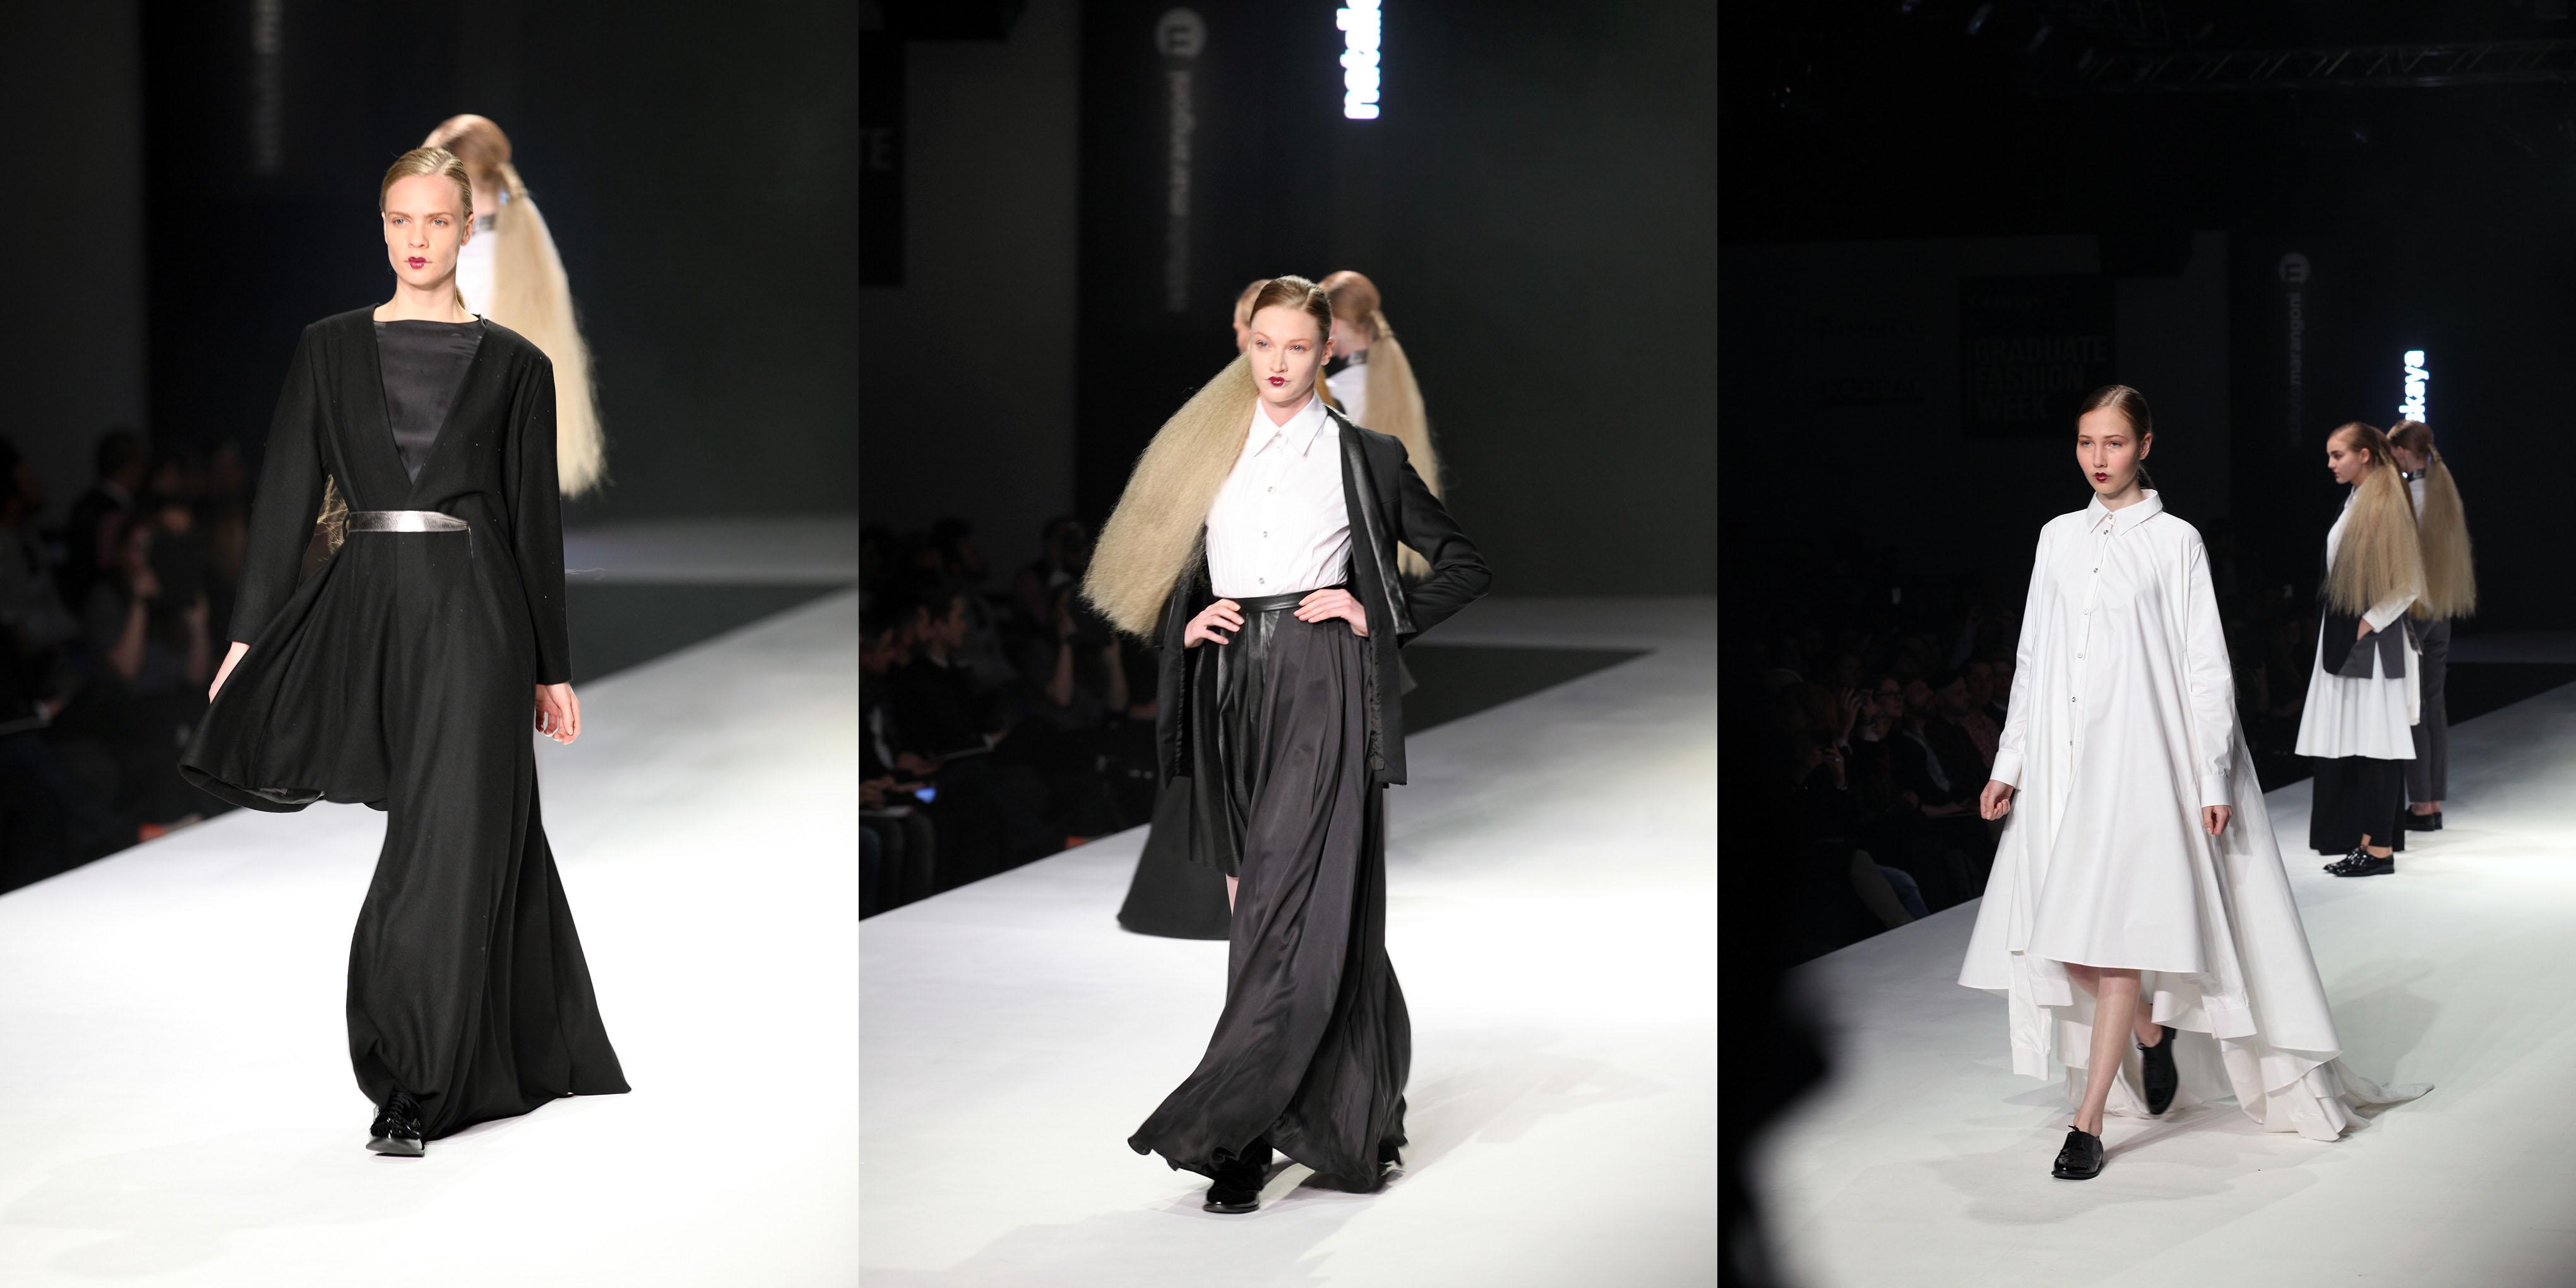 Graduate fashion week 2013 istituto marangoni phoenix for Istituto marangoni